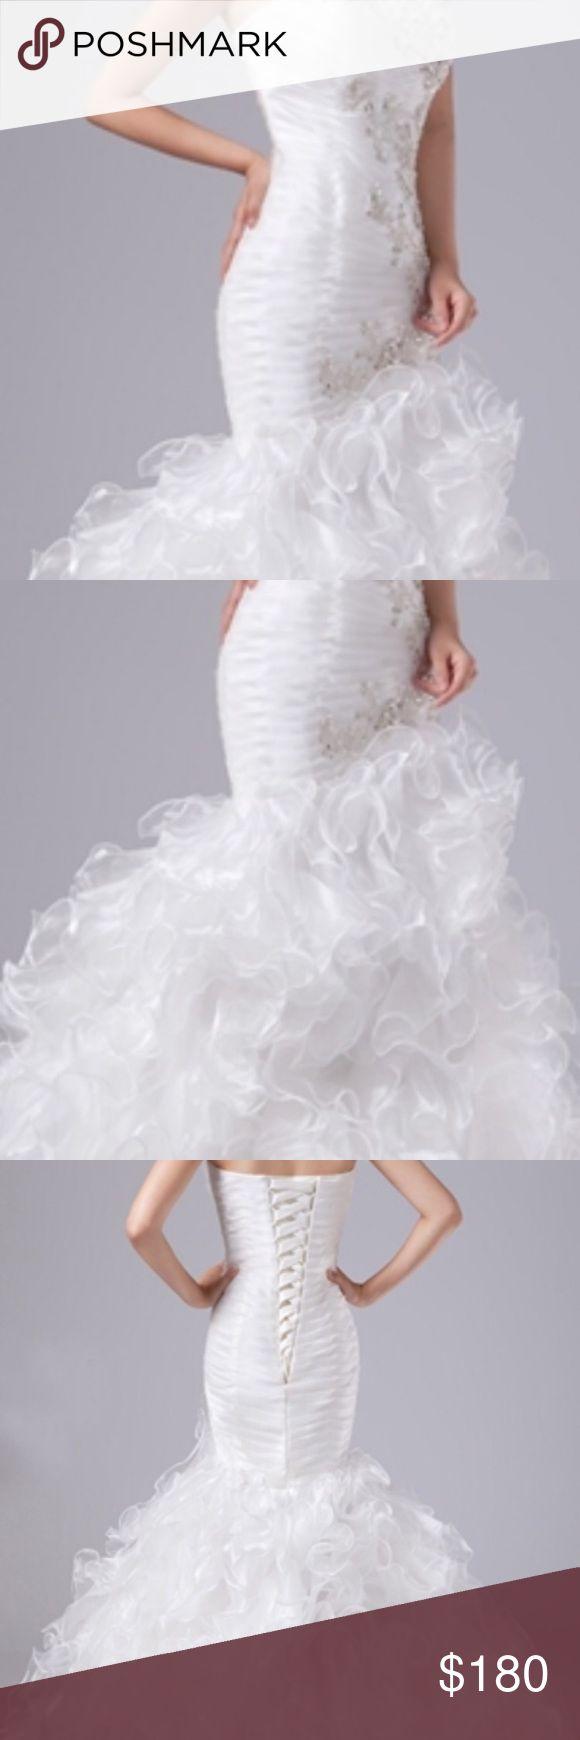 Trumpet Style Wedding Dress Smoke Free home never worn kept in clear garment bag. Very Elegant Dresses Wedding